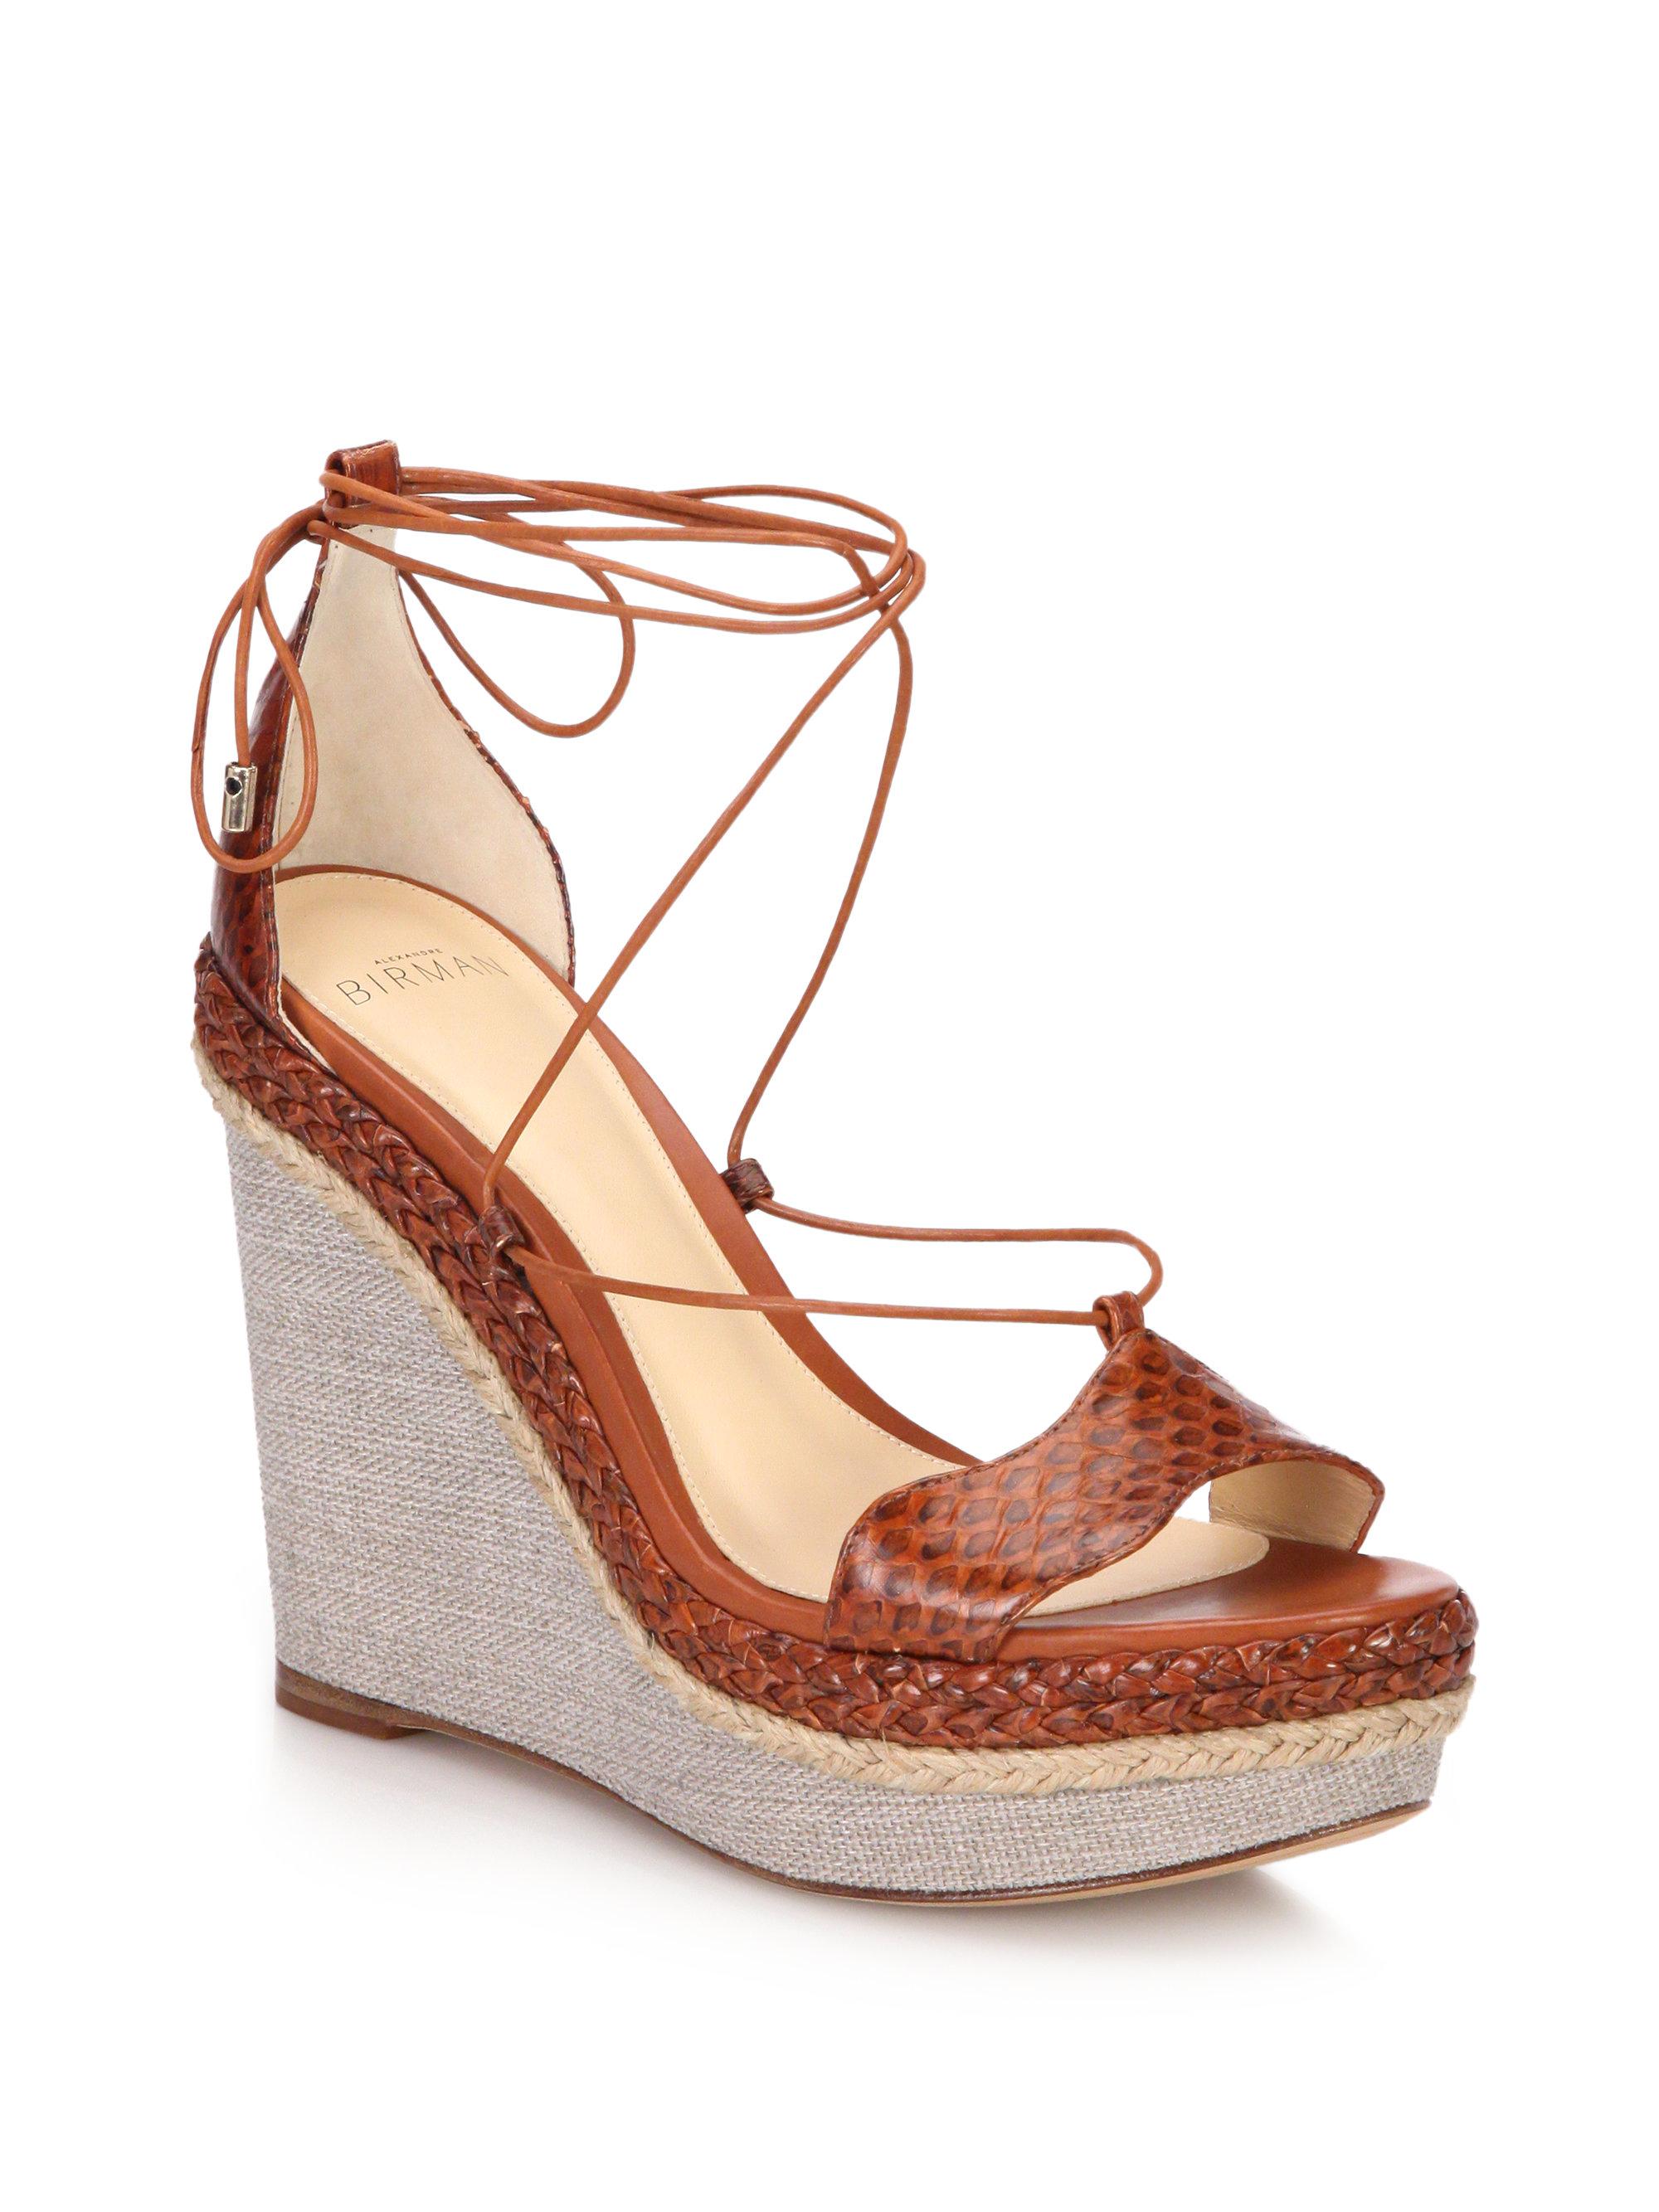 Alexandre Birman Snakeskin Sandal Wedges buy cheap discount CyVfjSHCT